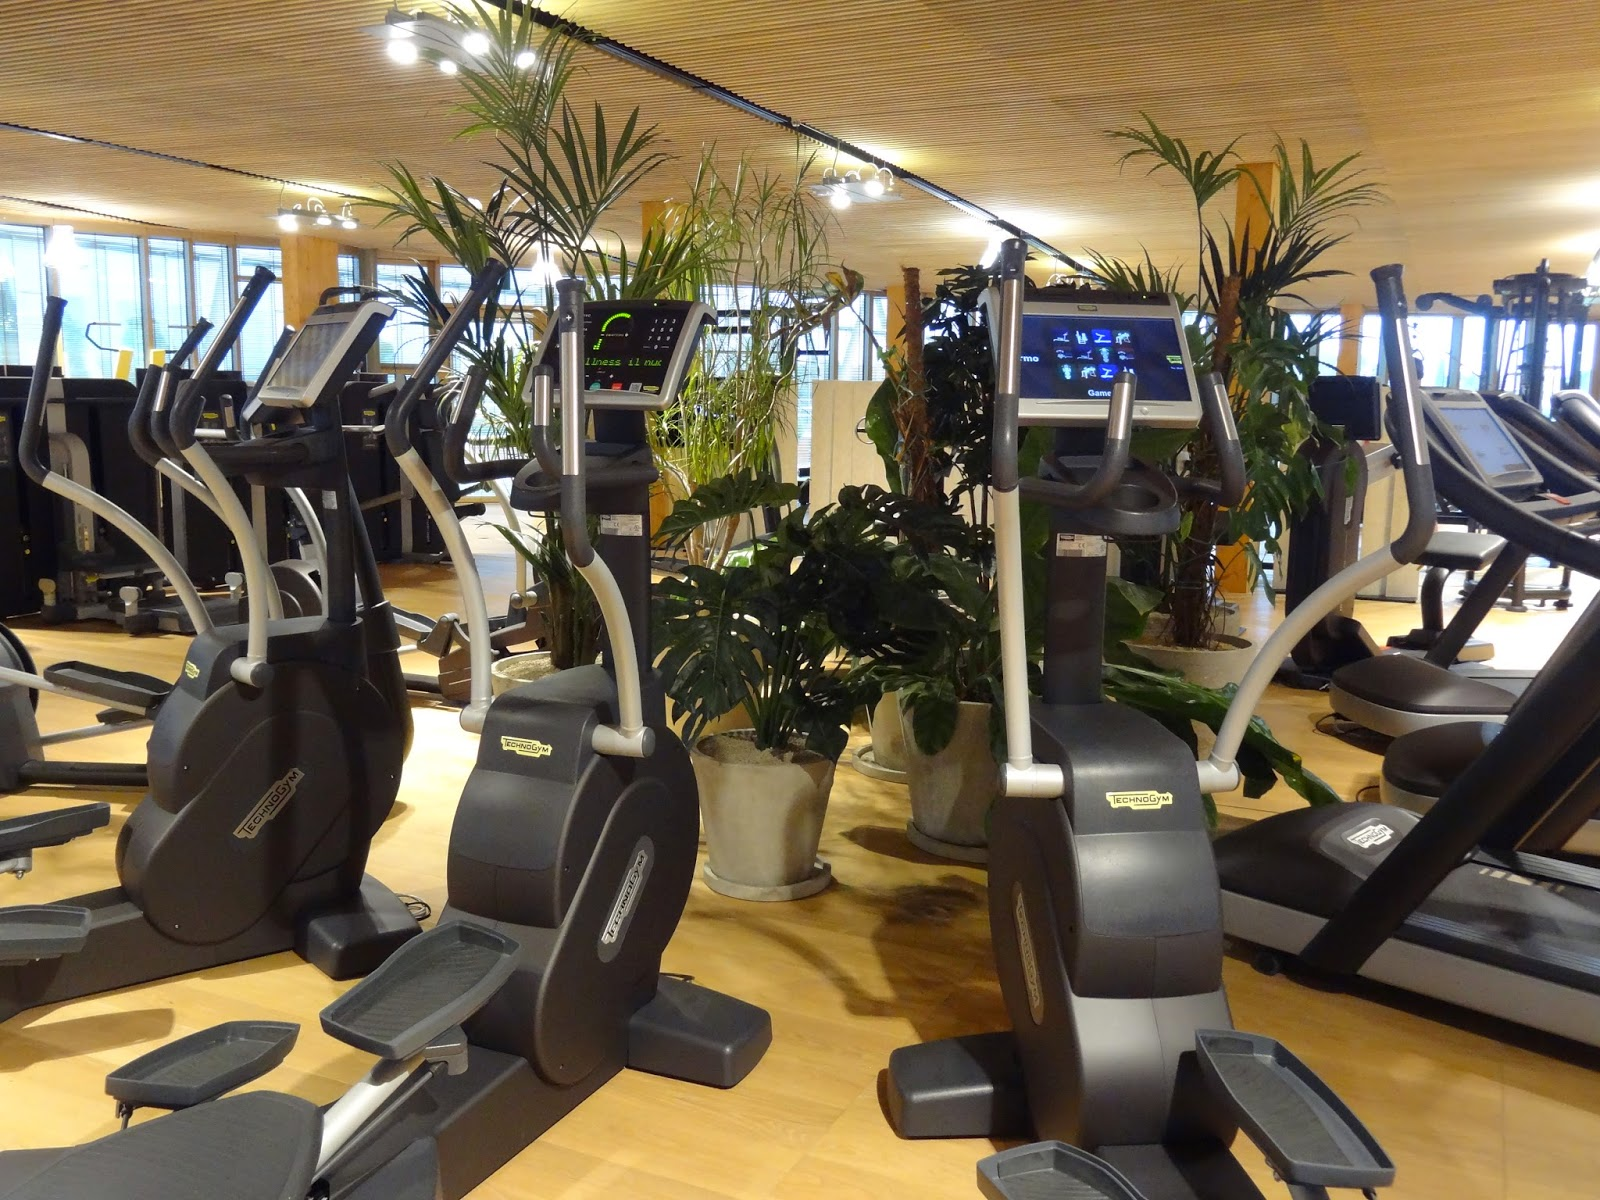 Technogym Wellness Village Gym Showroom Excite